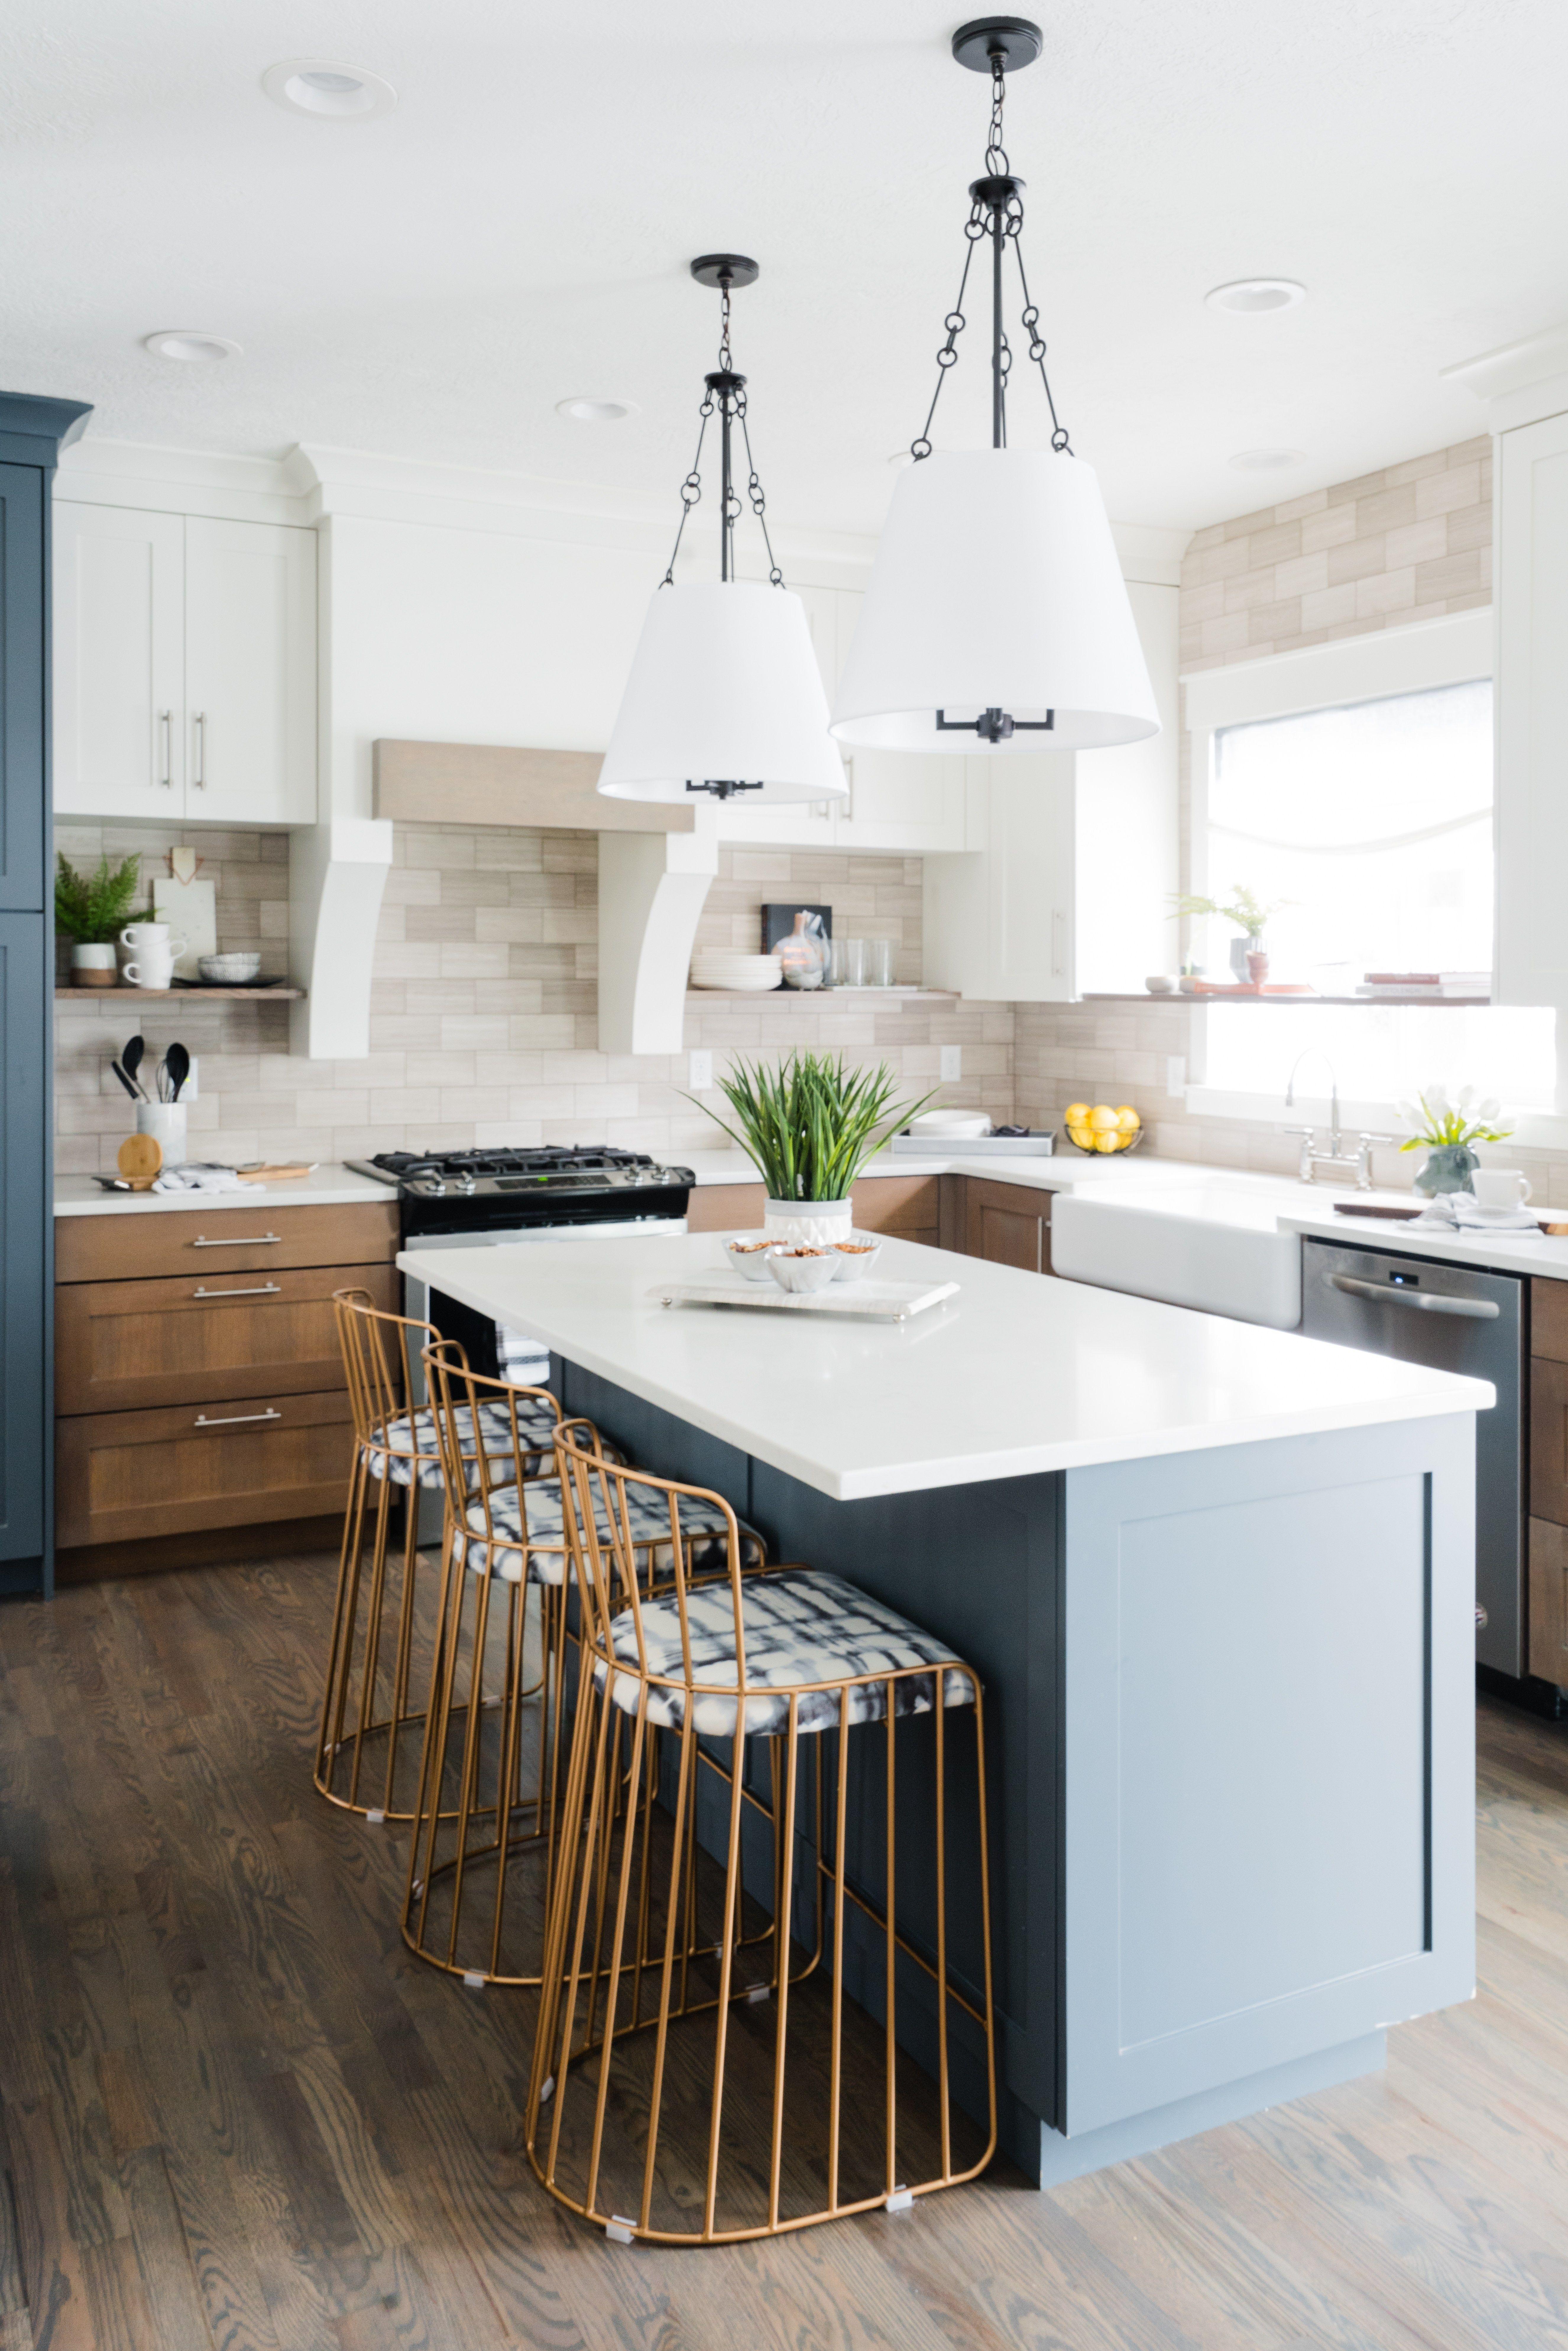 Teal White And Dark Wood Kitchen Brass Modern Counter Stools Black Island Lights Teal Kitchen Islan Modern Kitchen Design Modern Kitchen Kitchen Design